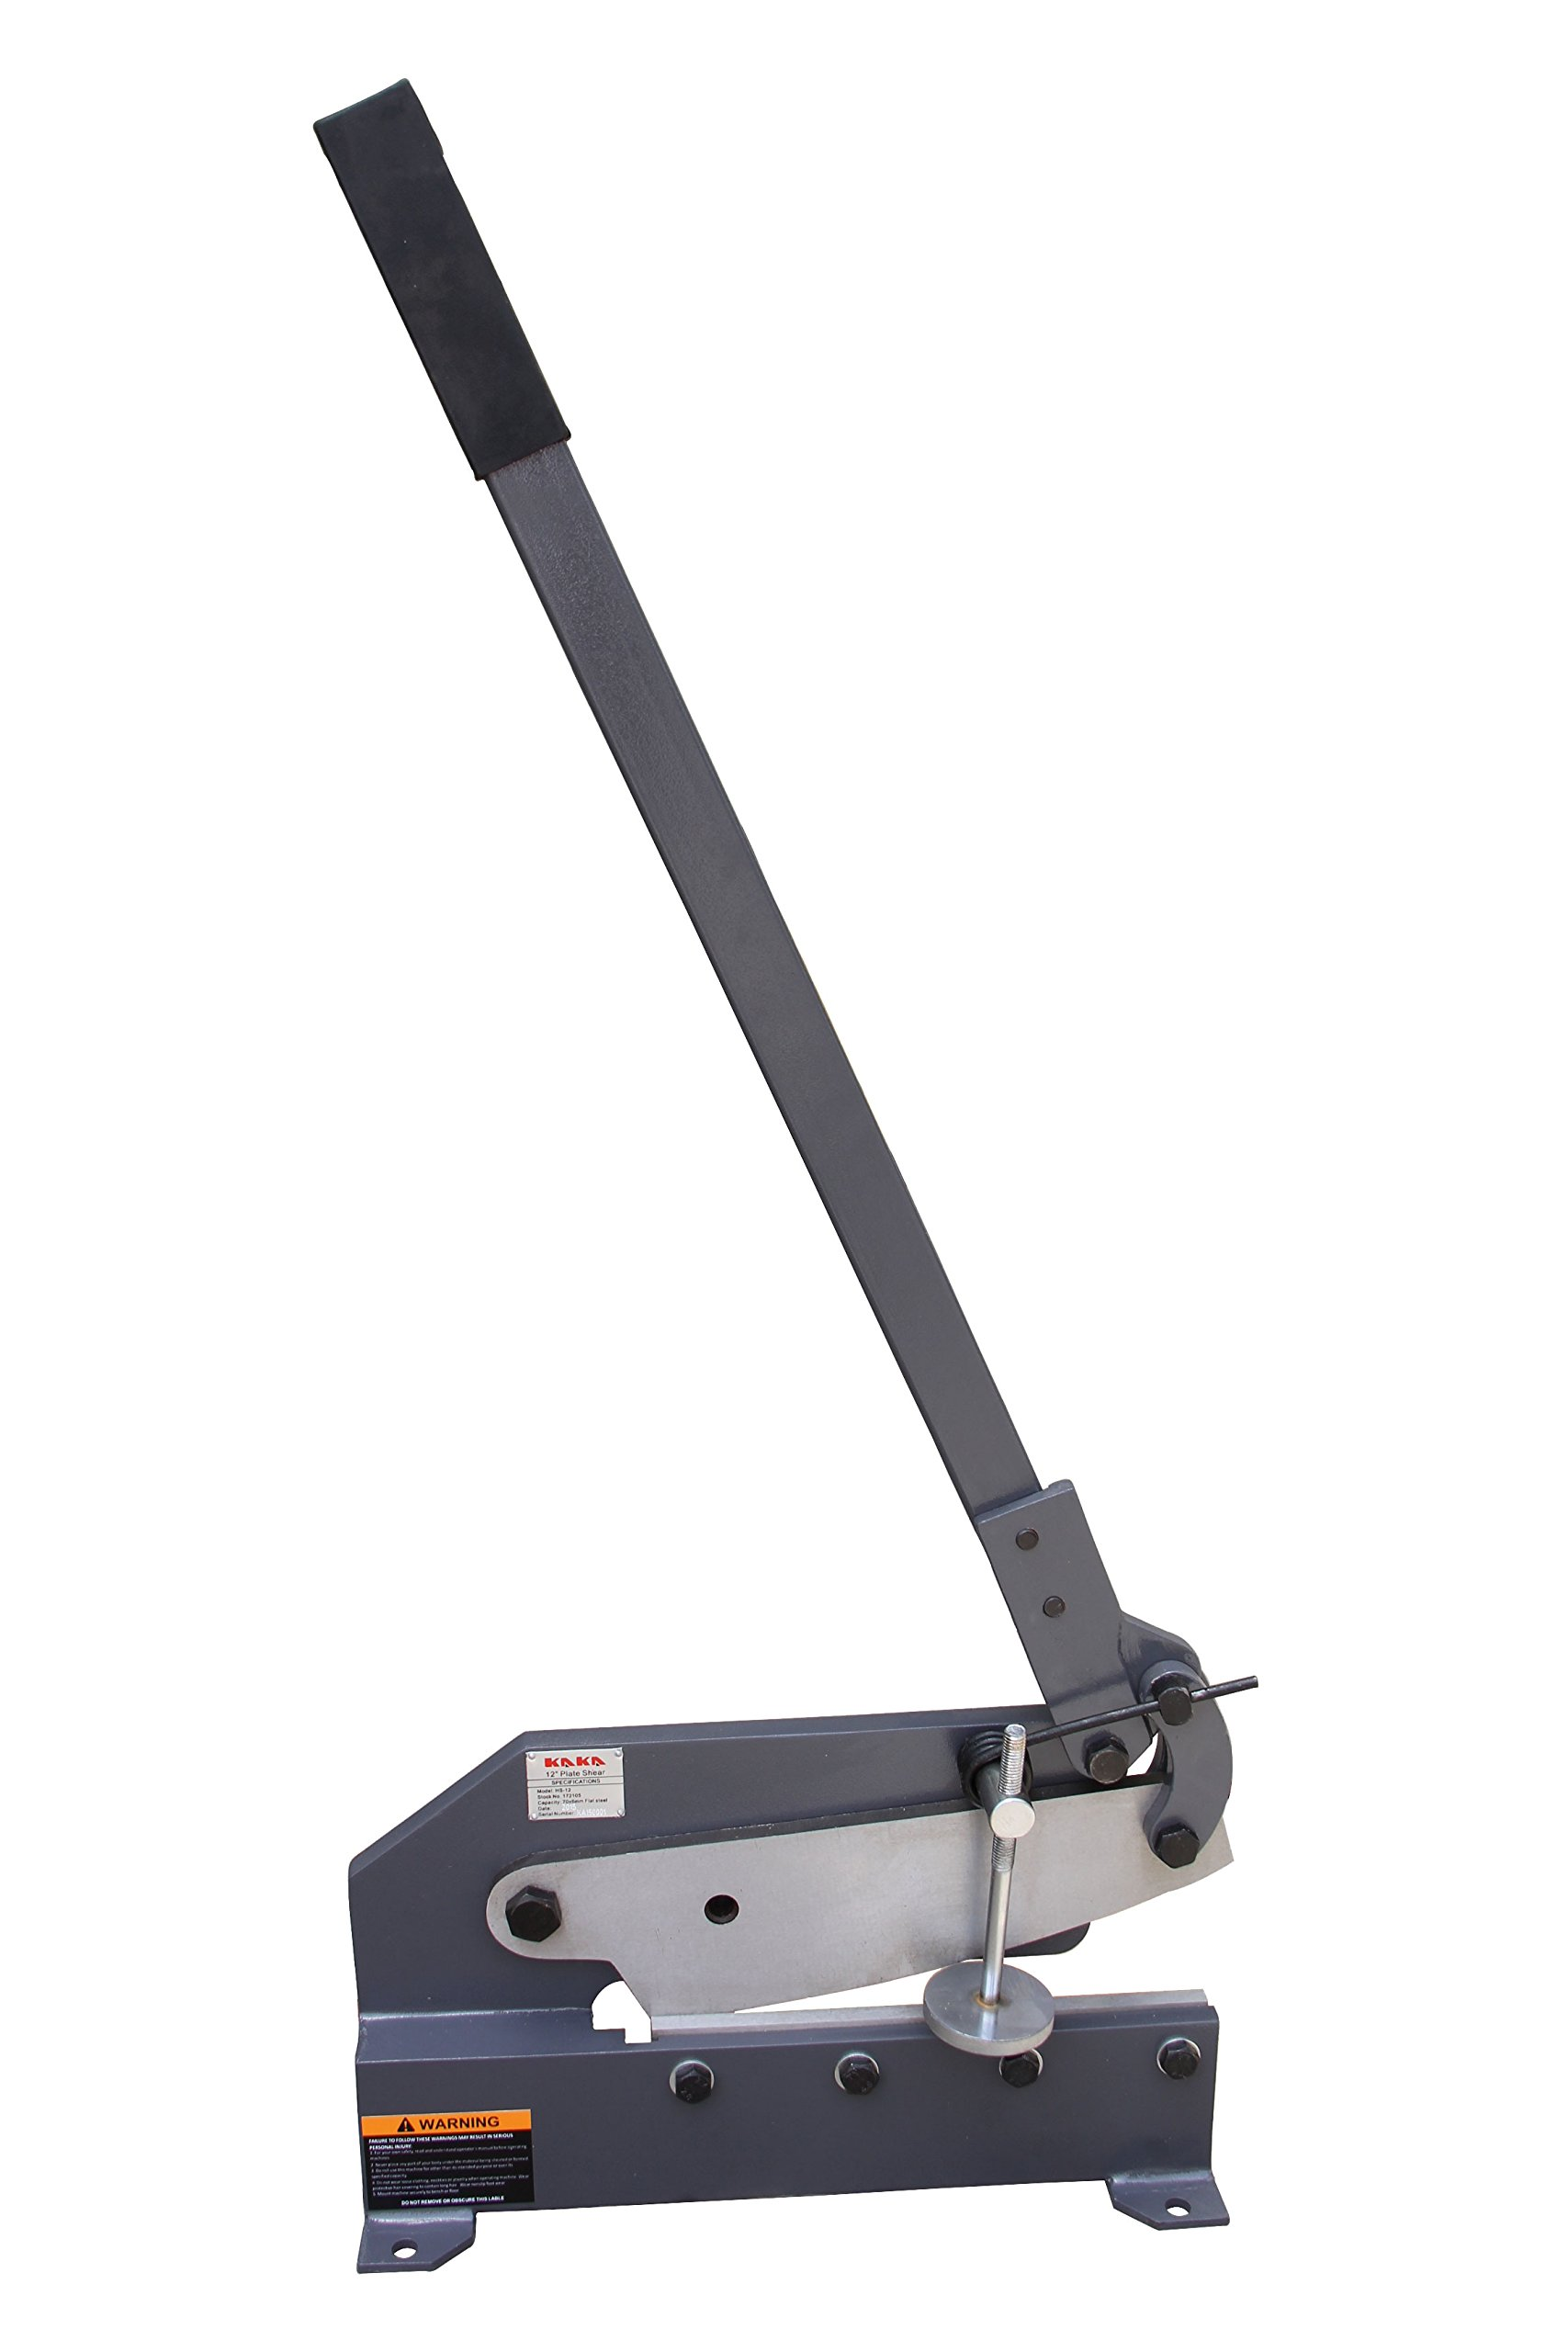 KAKA Industrial HS-12 12-Inch Sheet Metal Plate Shear, Solid Steel Frame, Mounting Type Metal Shear, High Precision Manual Hand Plate Shear